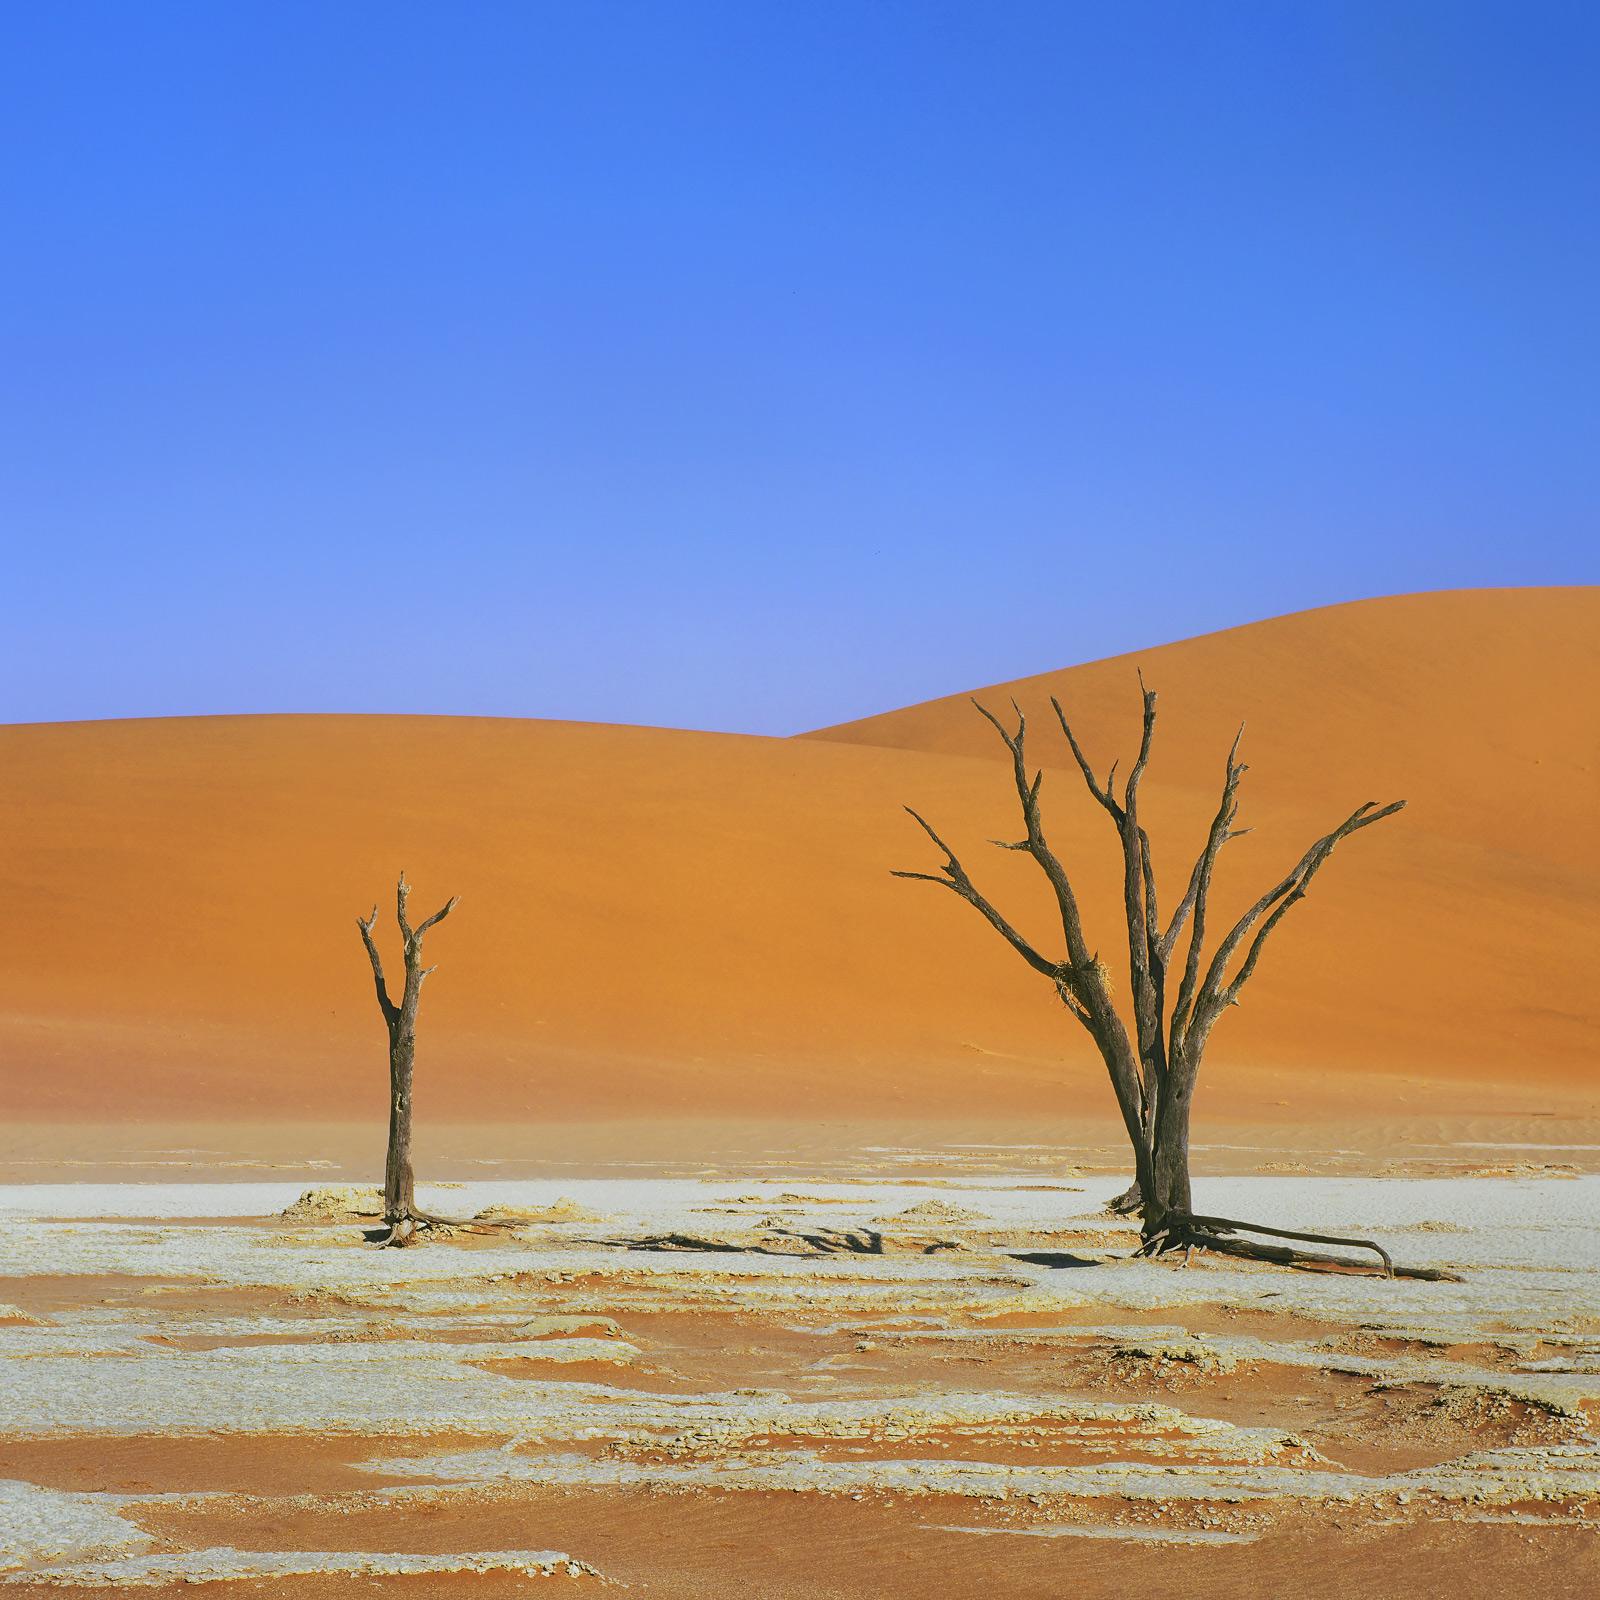 Dry Vlei, Dead Vlei, Sossusvlei, Namibia, Camel Thorn trees, salt pan, surreal, primary, colours, clear, blue, sky, oran, photo